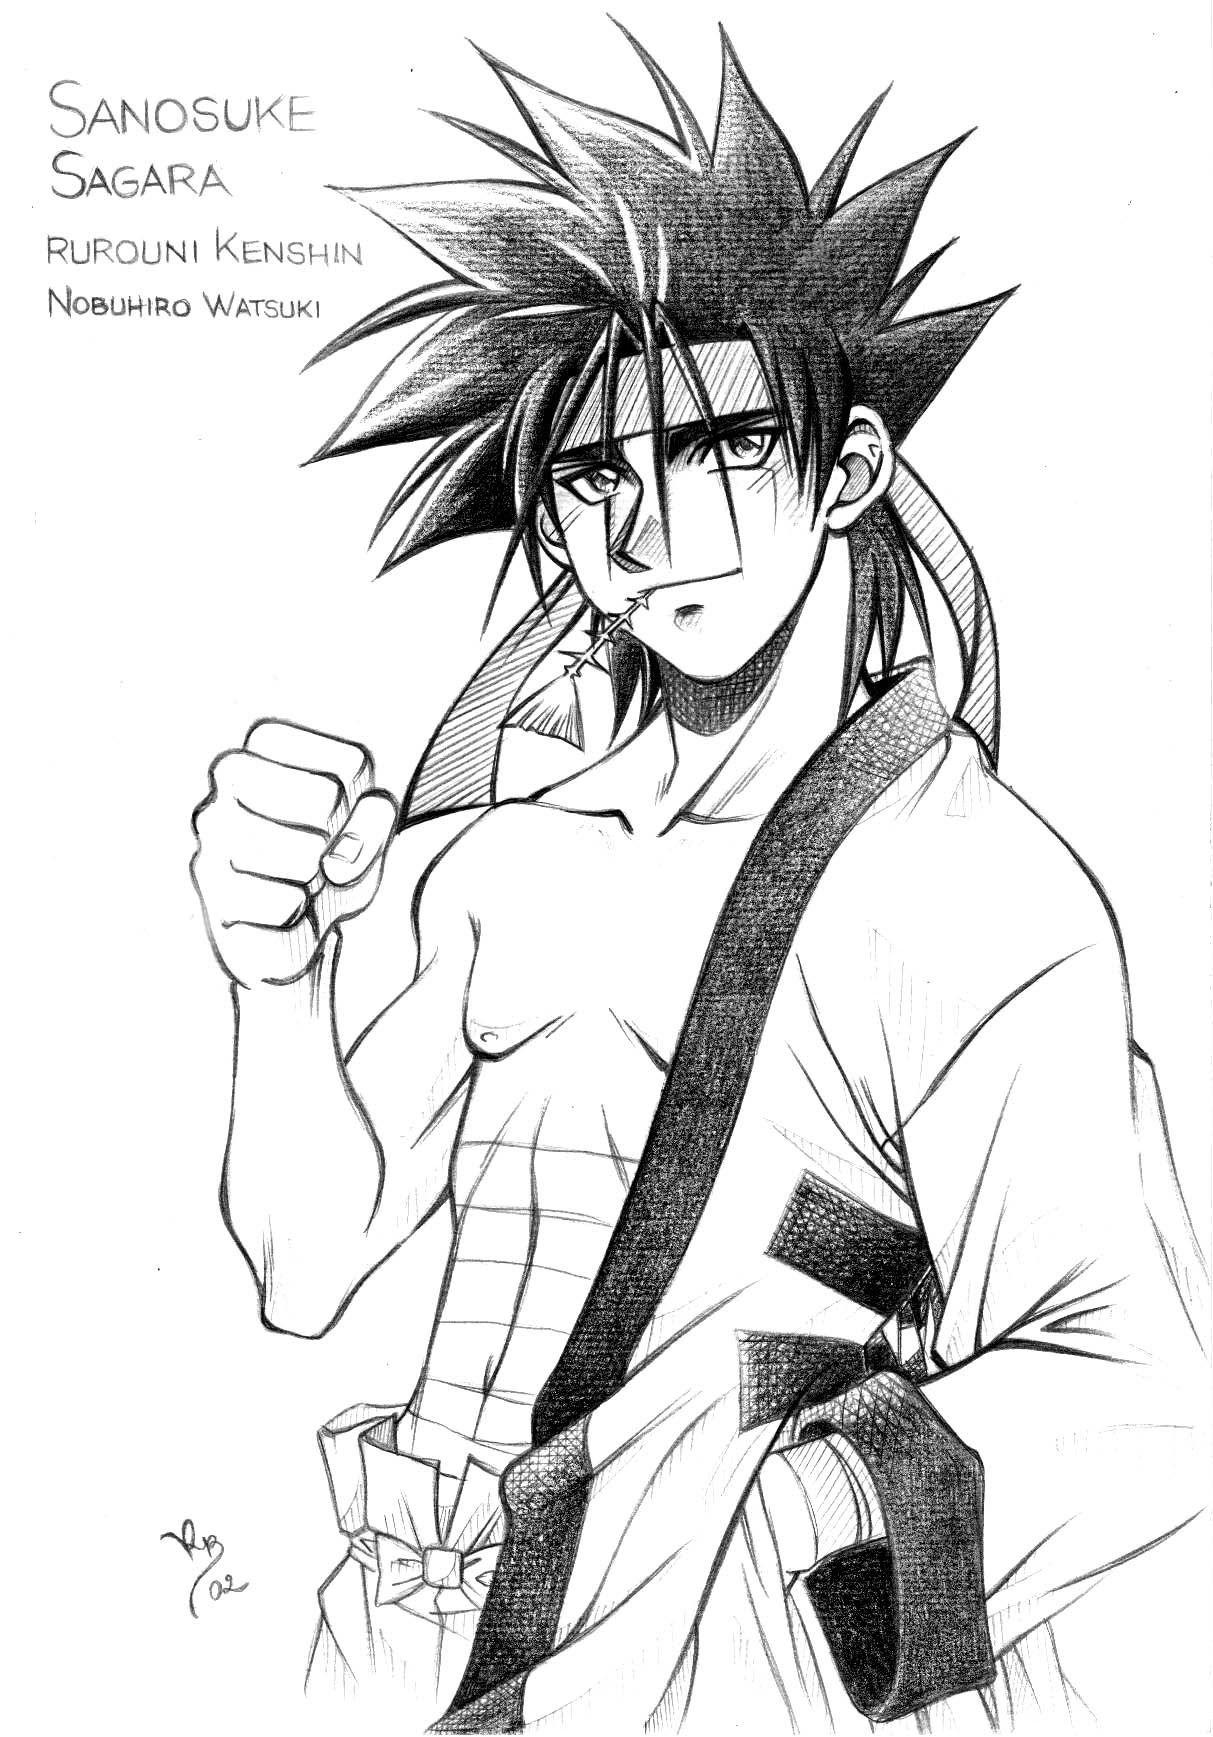 Sanosuké Sagara  renaissancealpha51fr1net